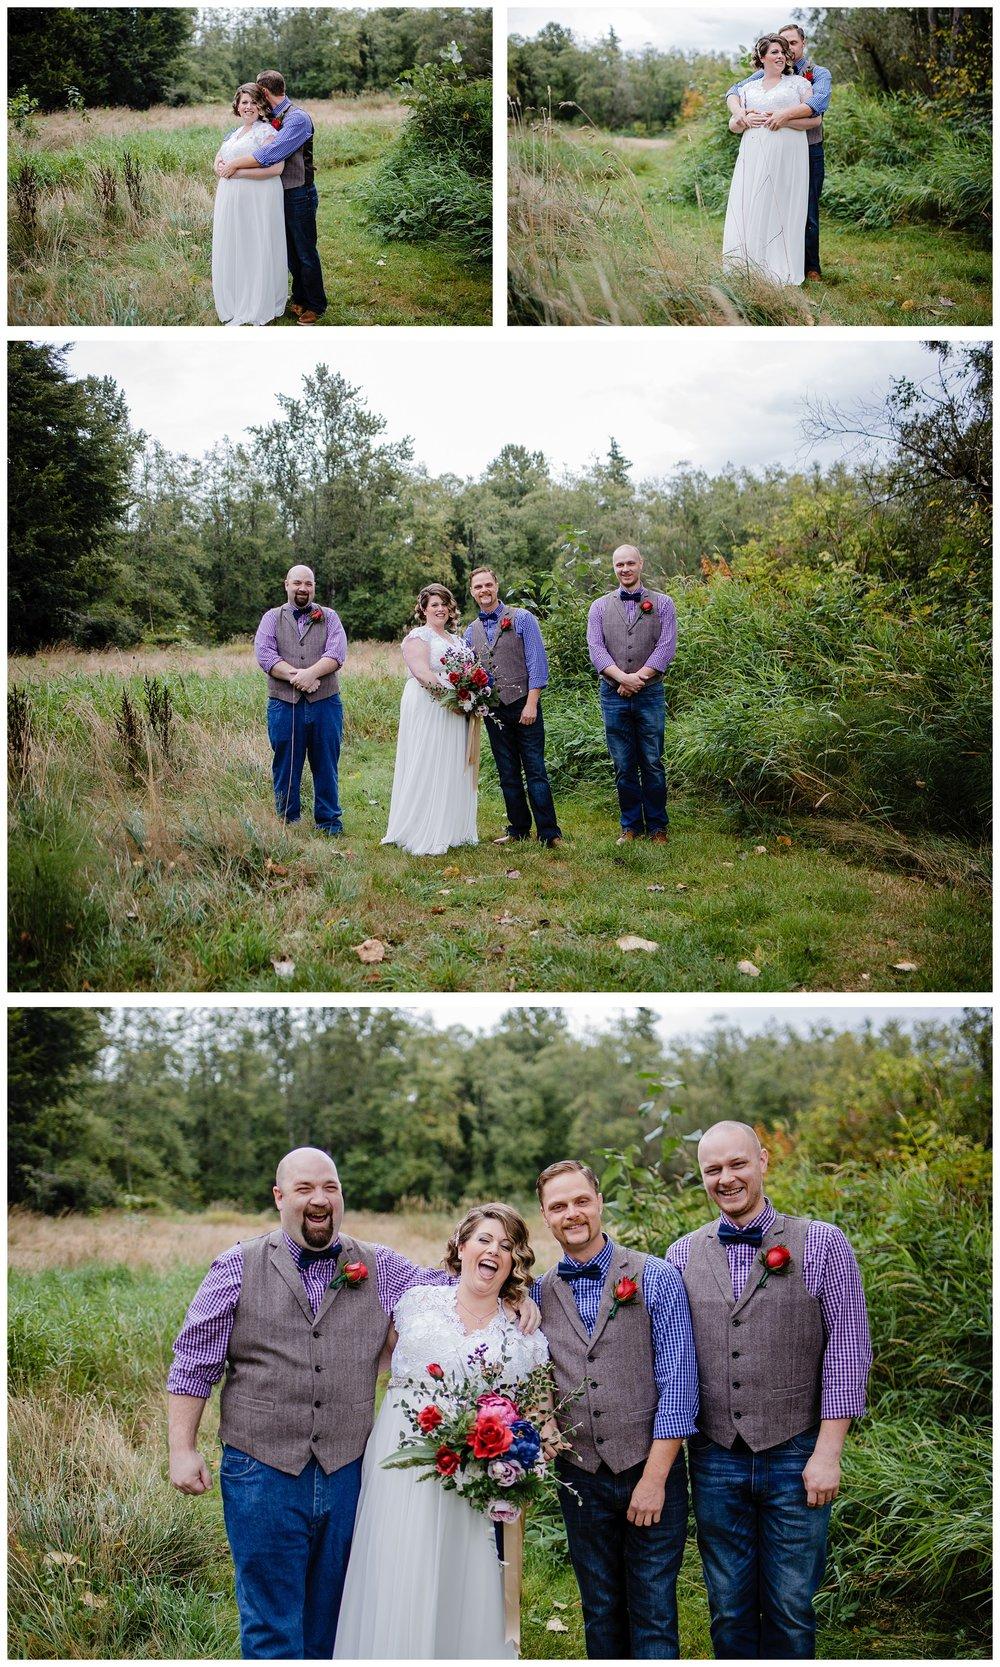 Aldergrove Park Fall Backyard Wedding Photographer Pregnant Bride Tent Outdoor BC Canada Best Wedding Photographer_0024.jpg